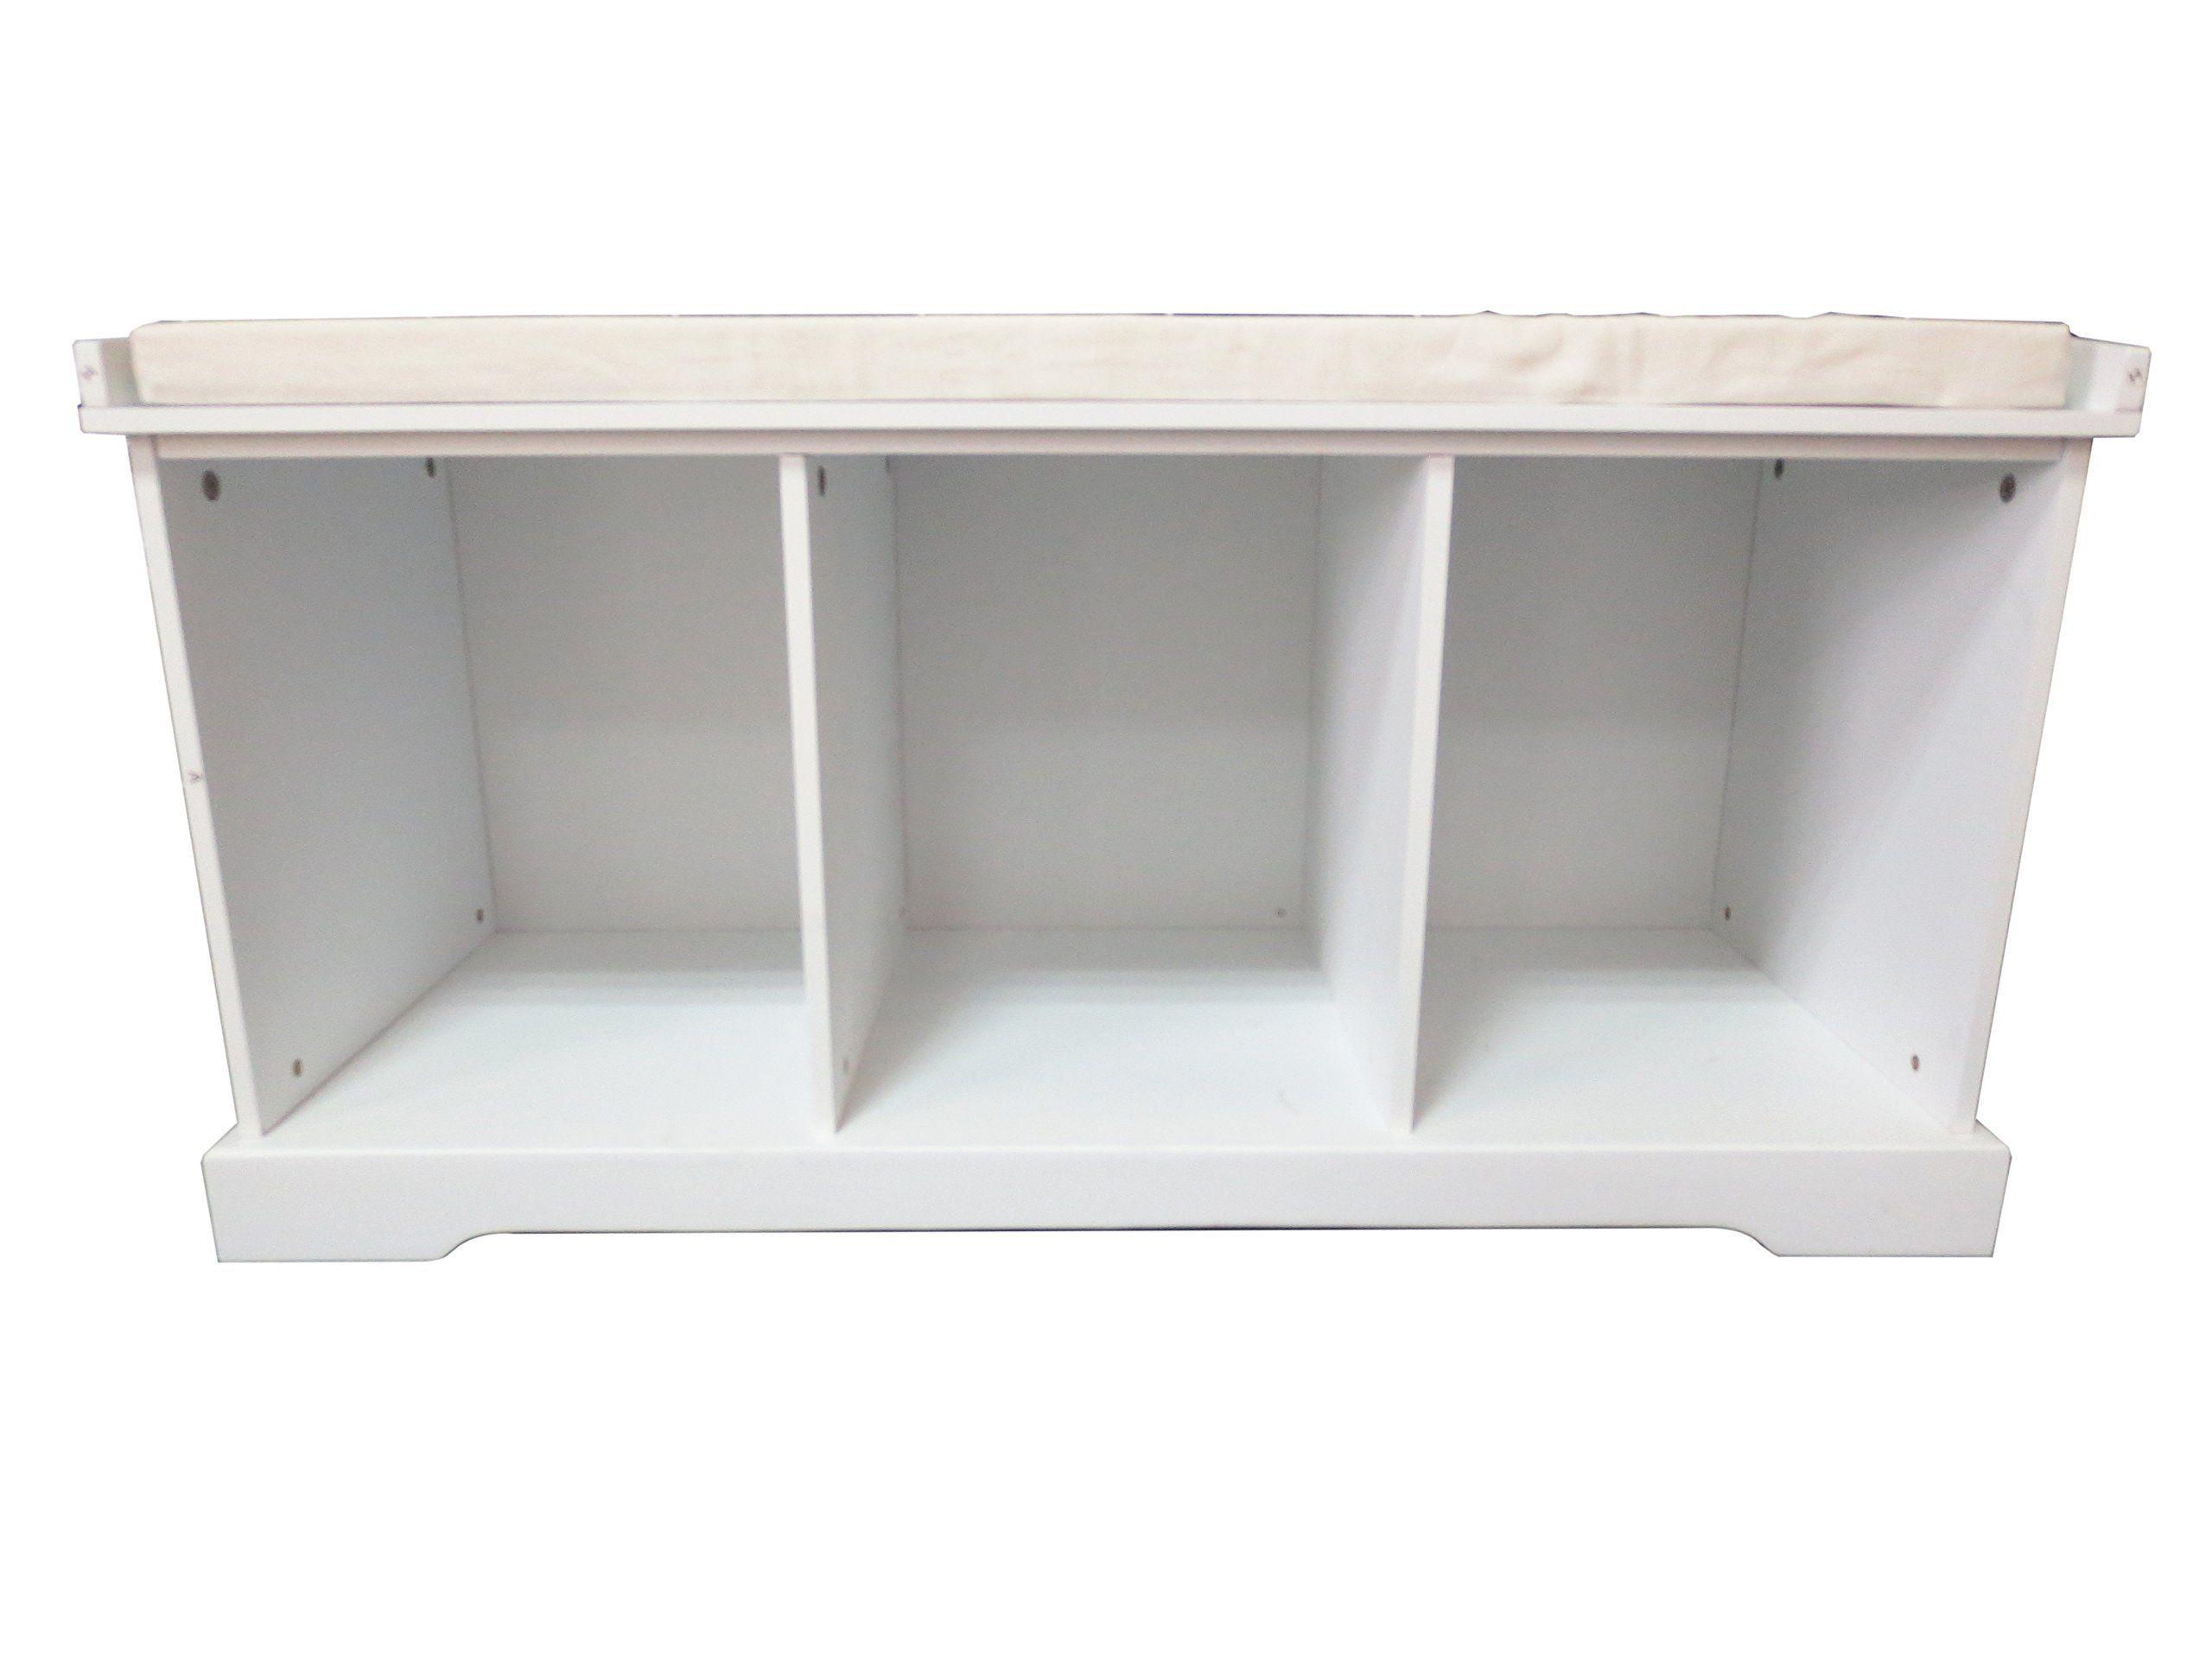 Amazon.com: Inskeppa White Entryway Storage Bench - Cubby Hole ...